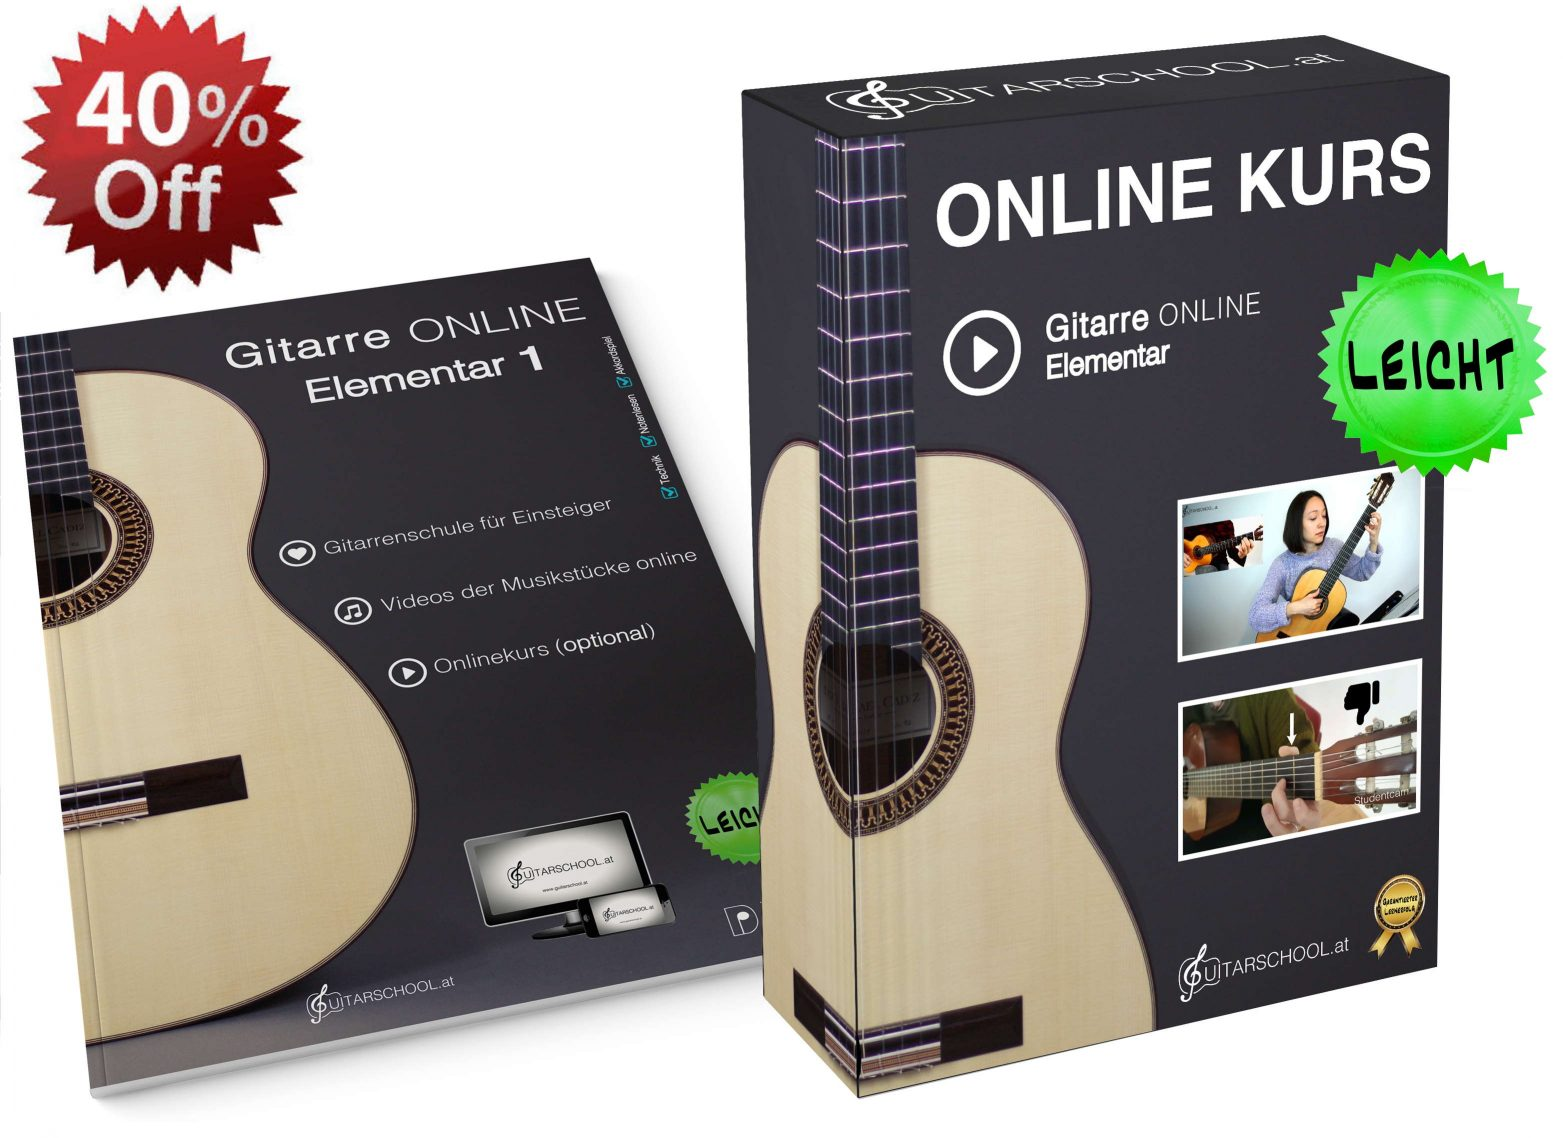 Onlinekurs Gitarre Angebot